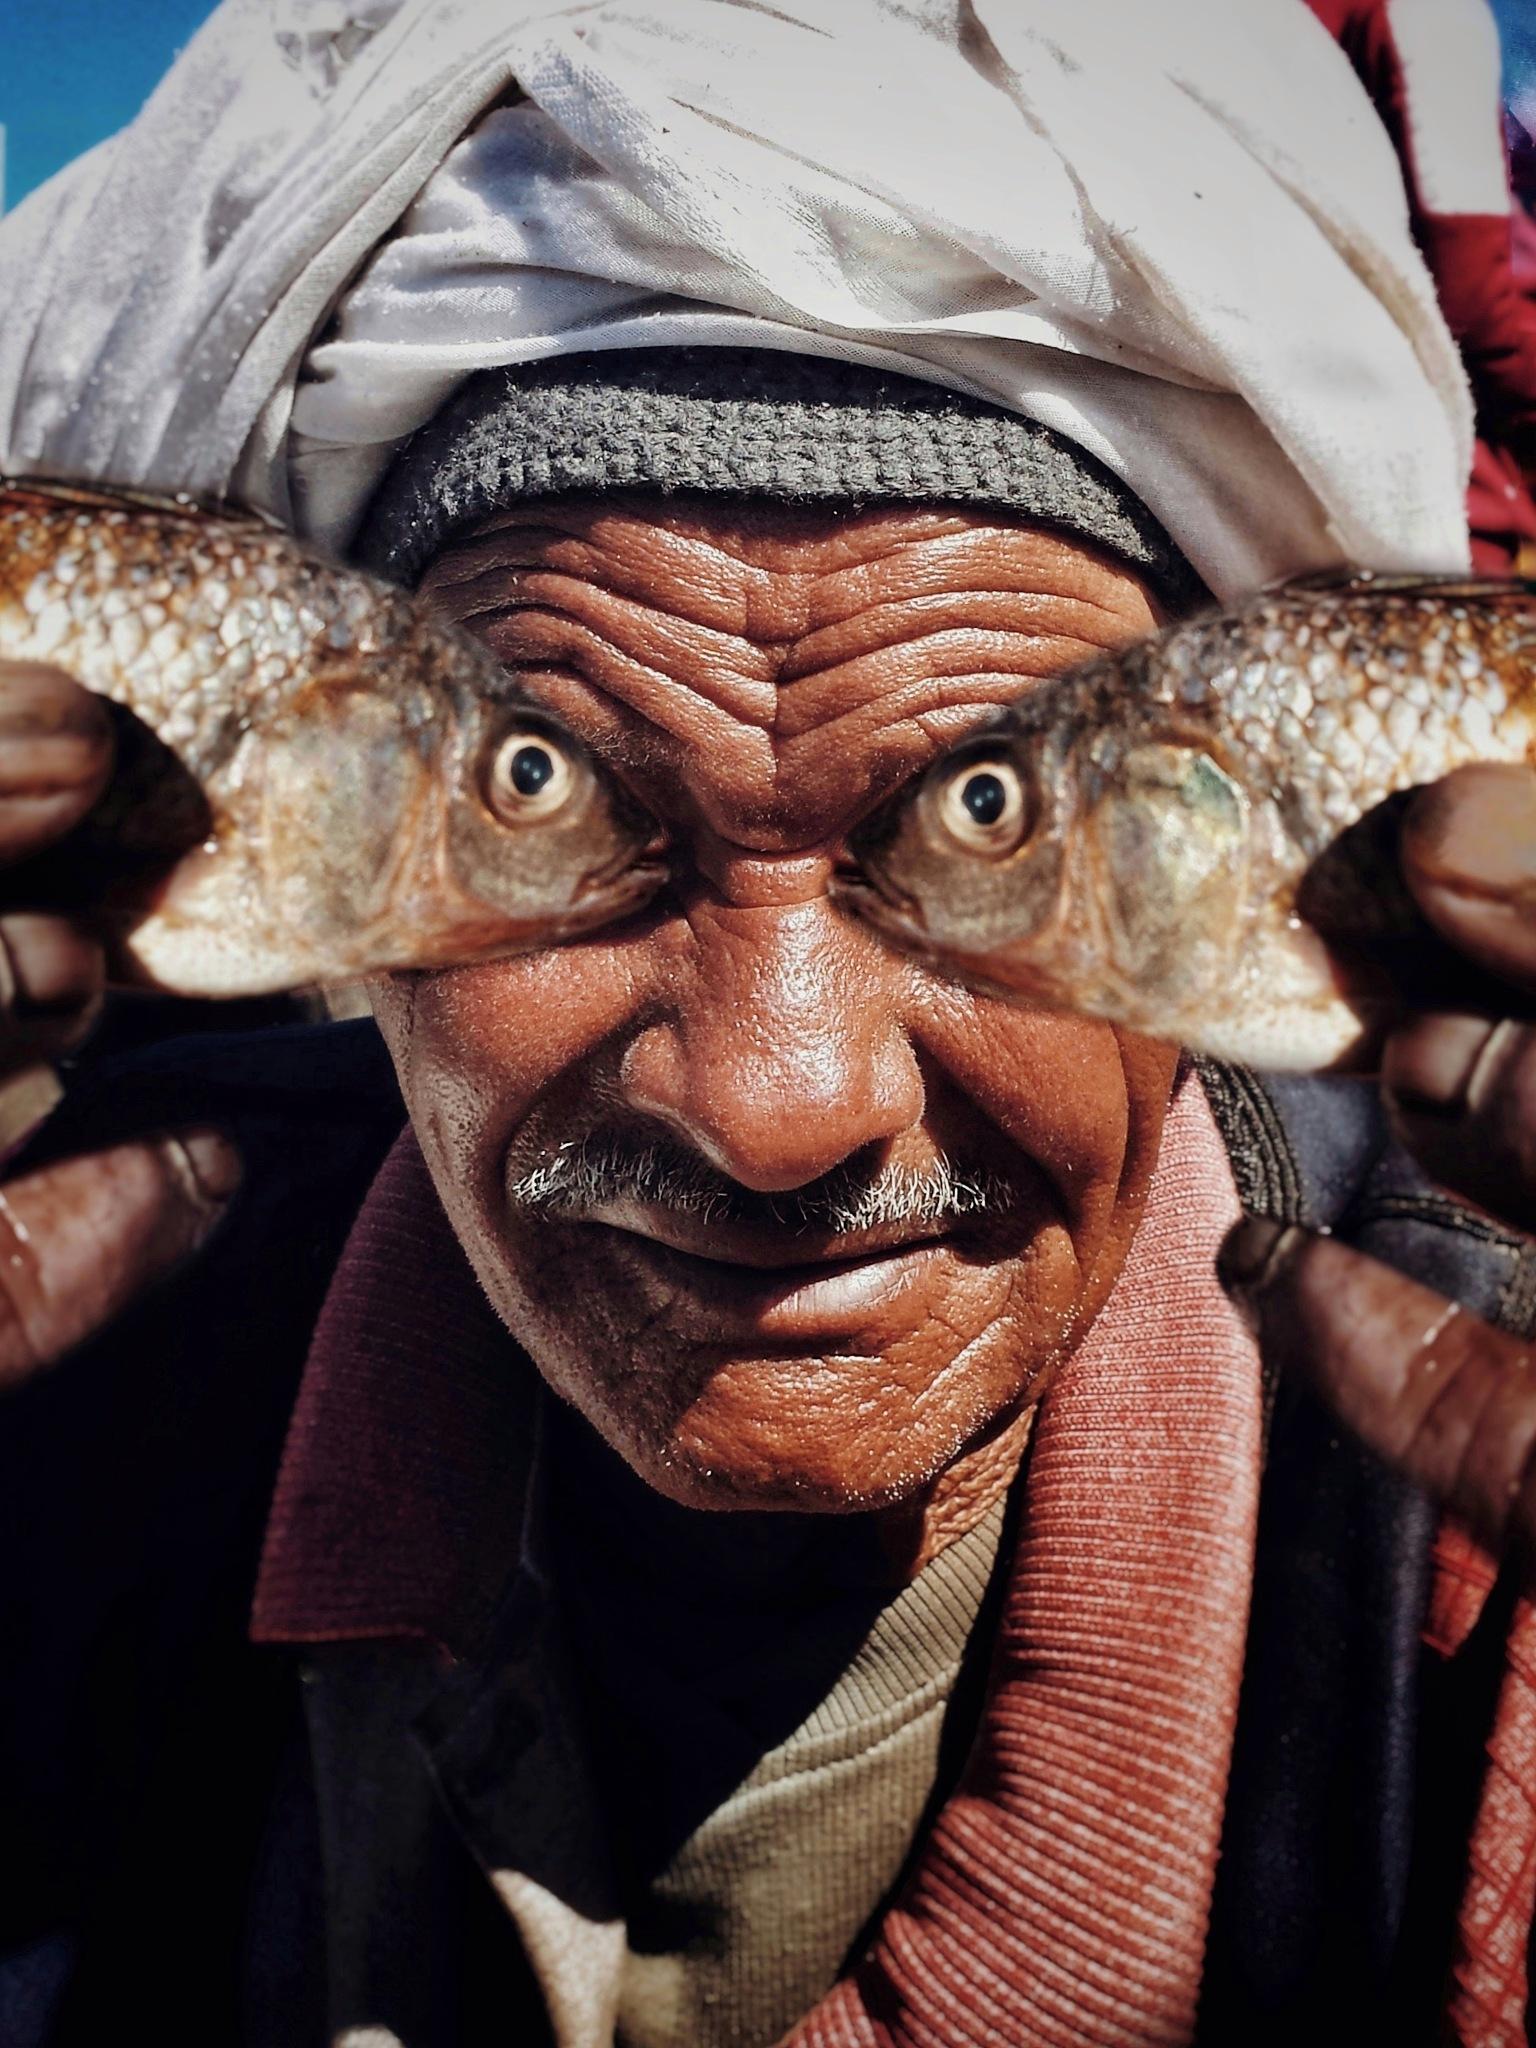 fish eye man by midoziko980